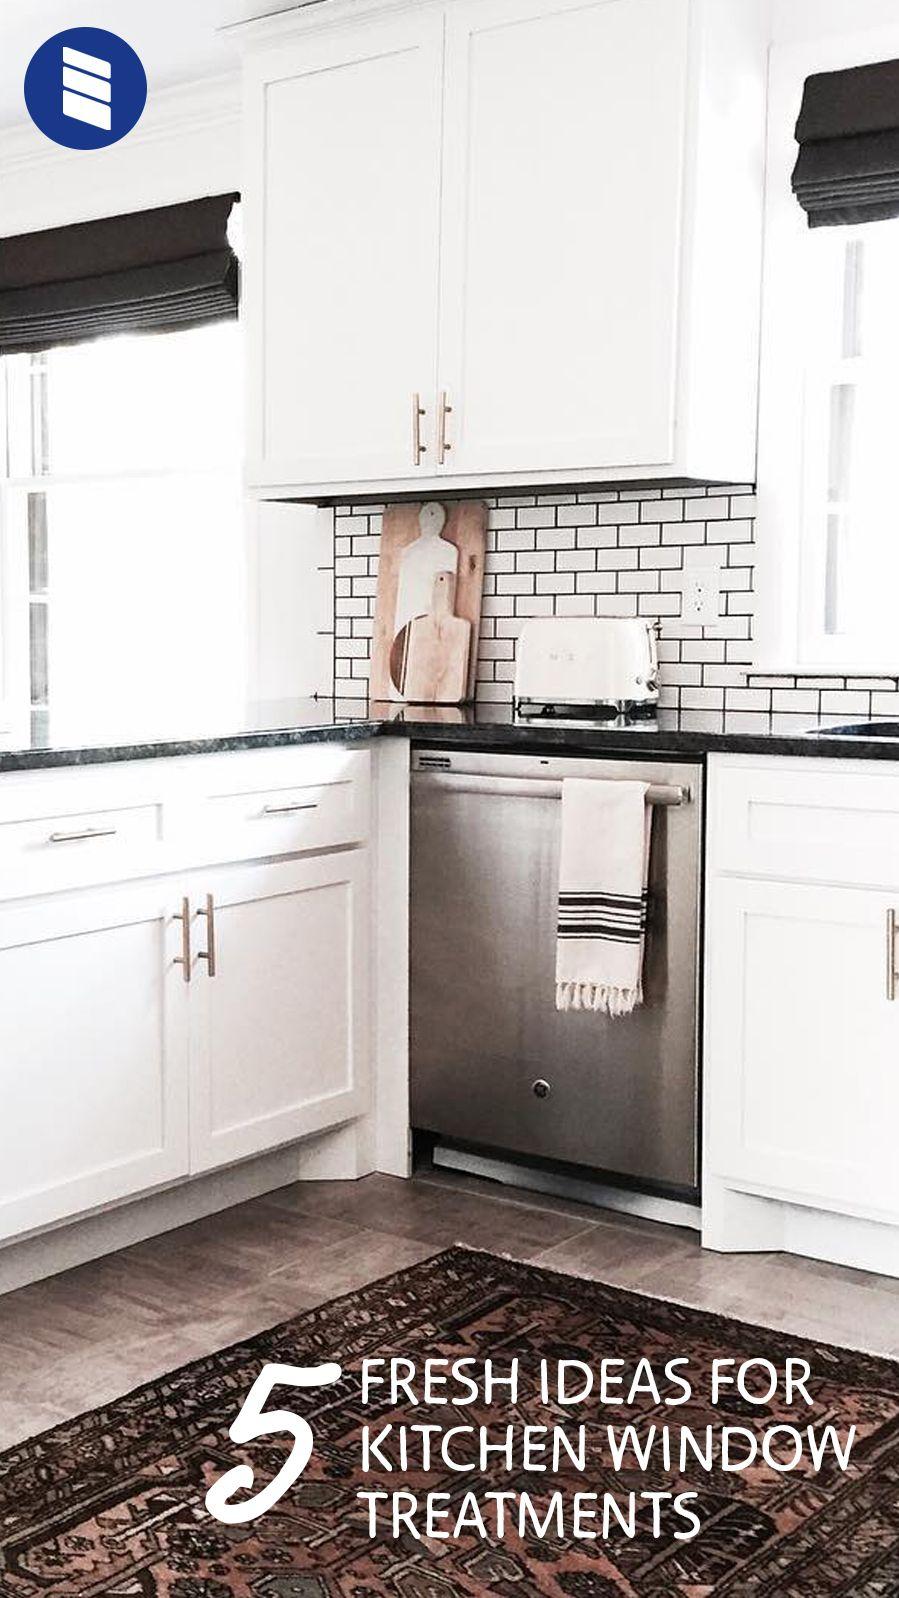 5 Fresh Ideas for Kitchen Window Treatments | Kitchen window ...